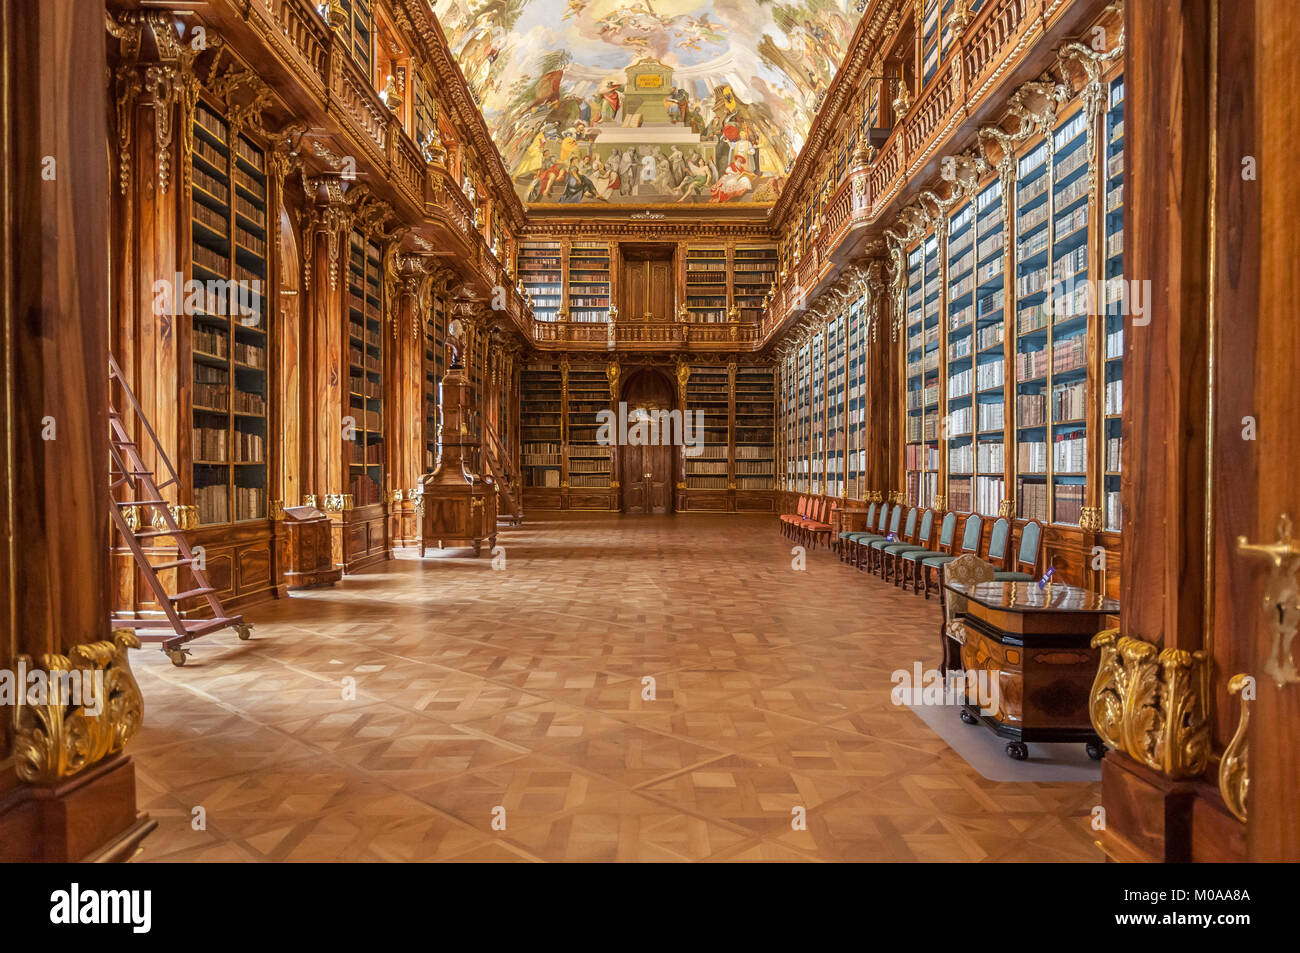 Strahov Monastery Library - Stock Image